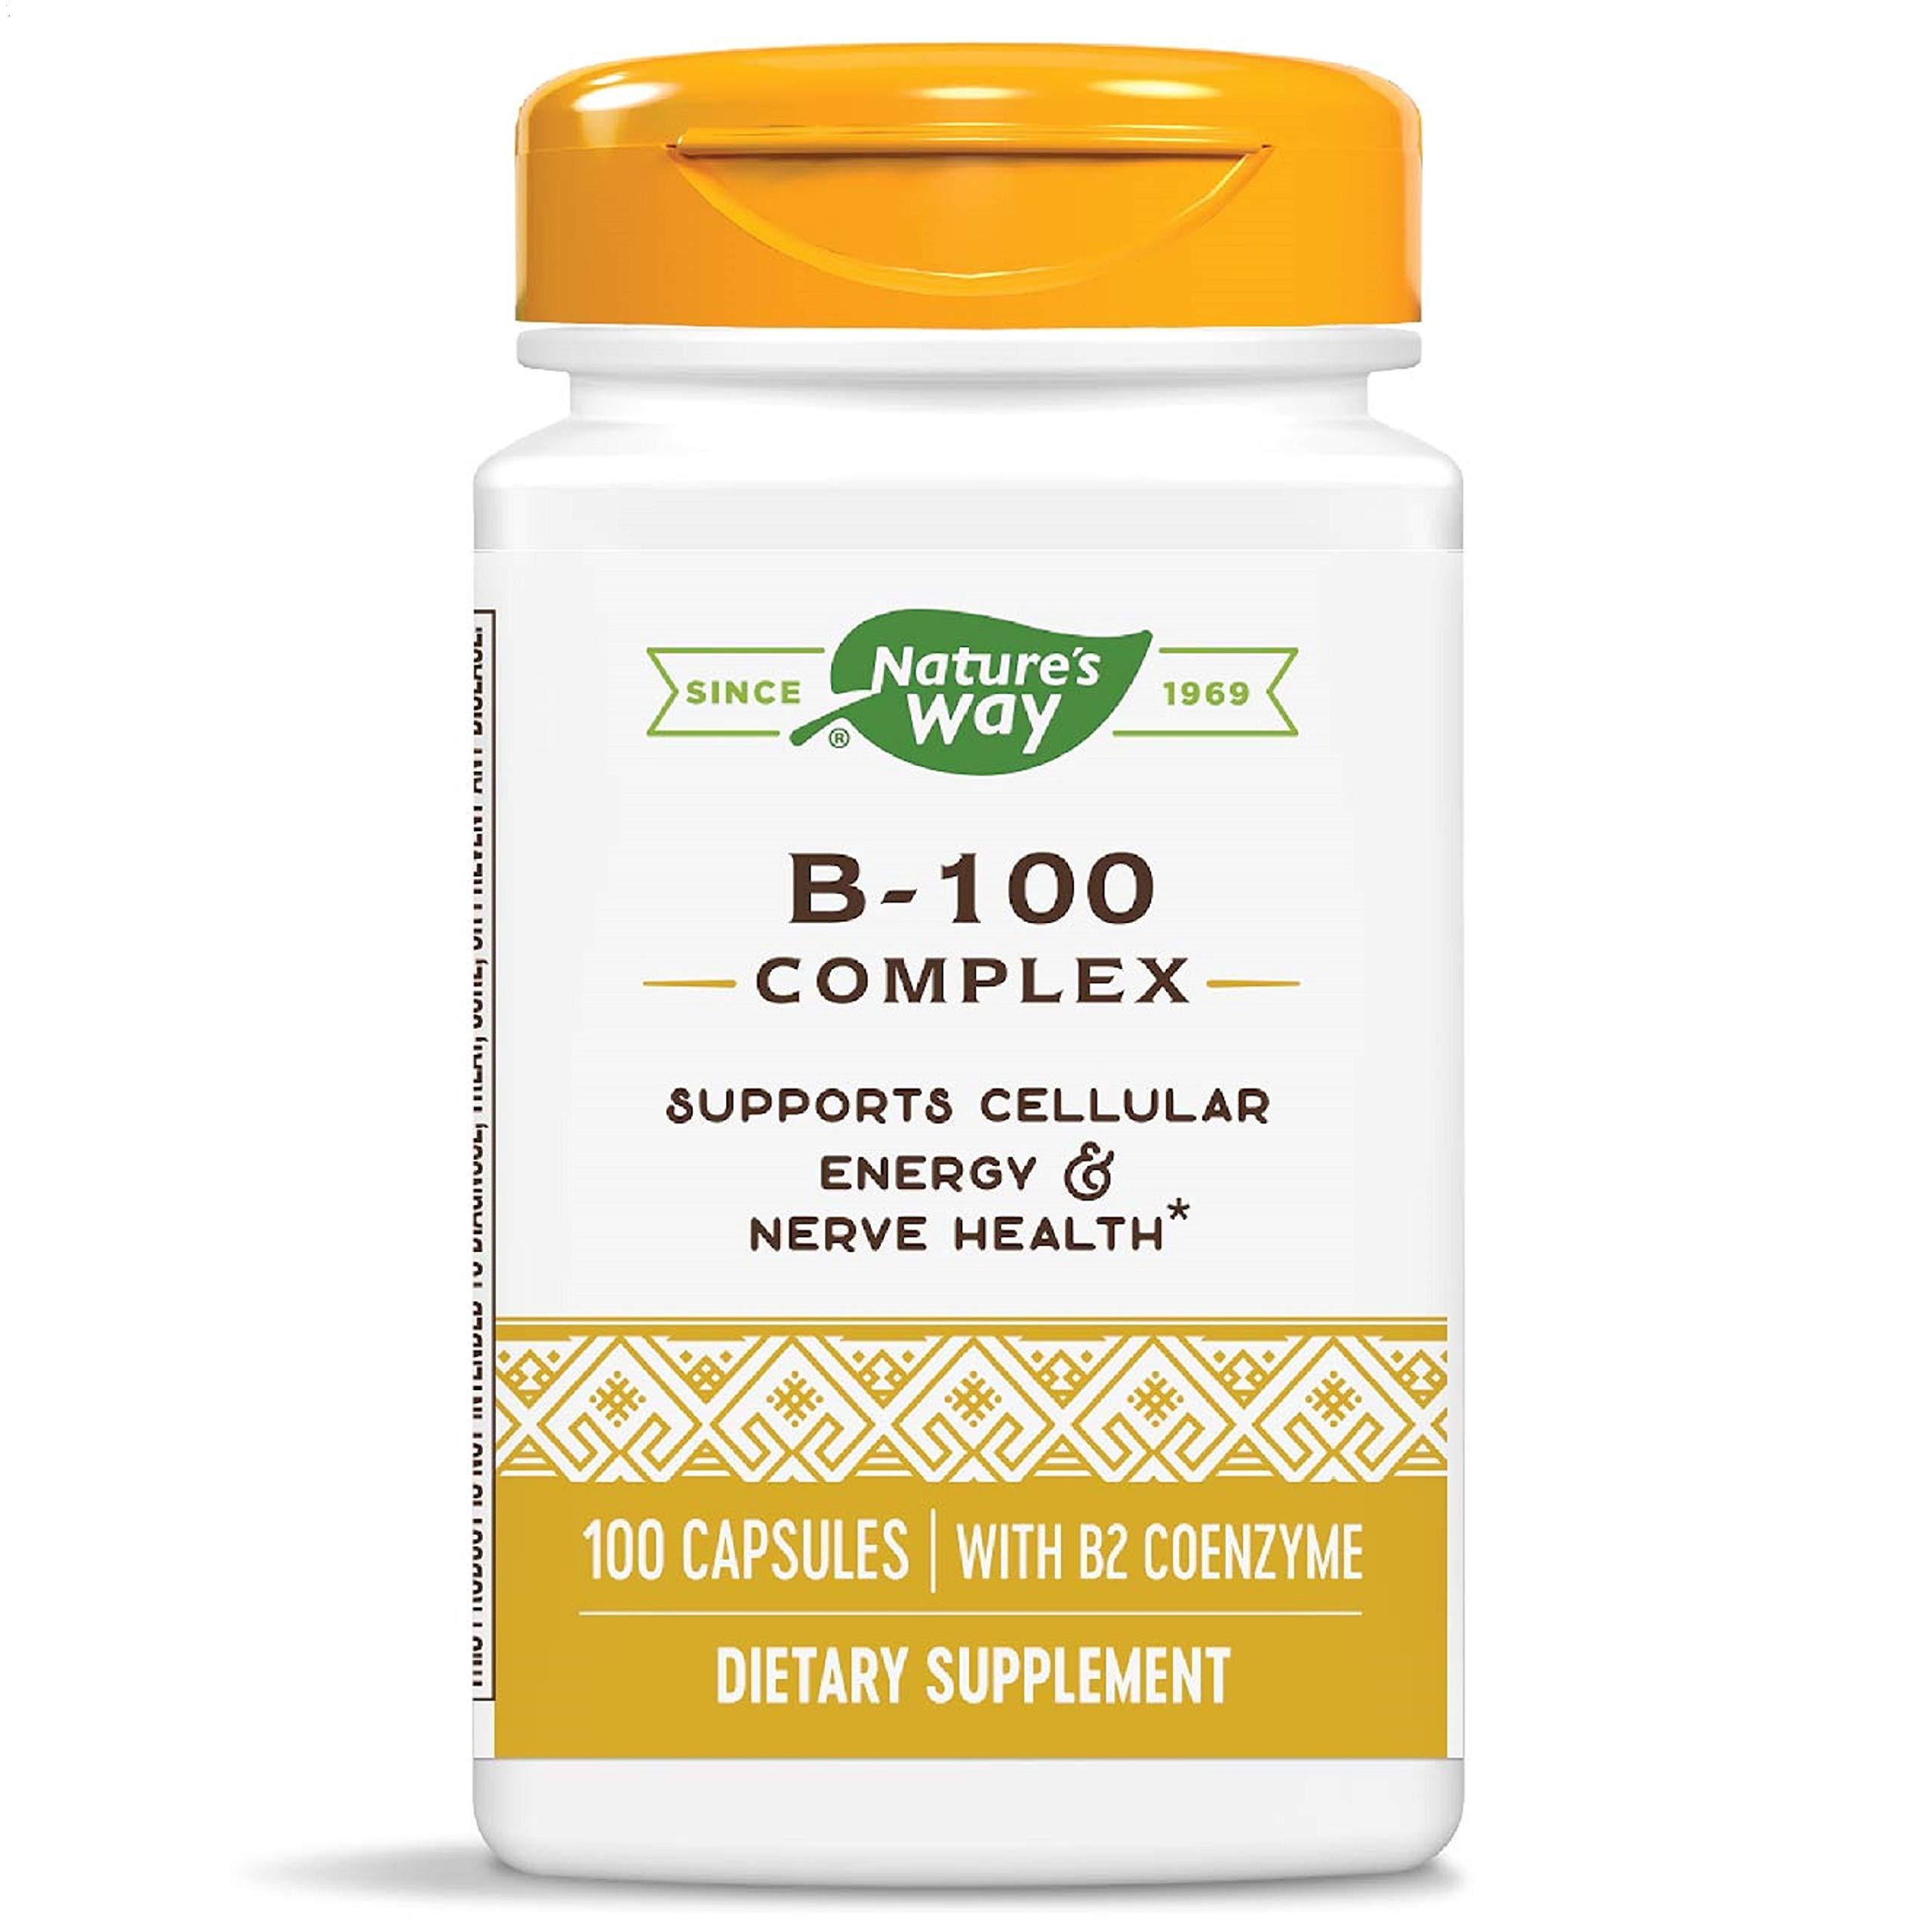 Nature's Way Vitamin B-100 Complex, 100 Capsules